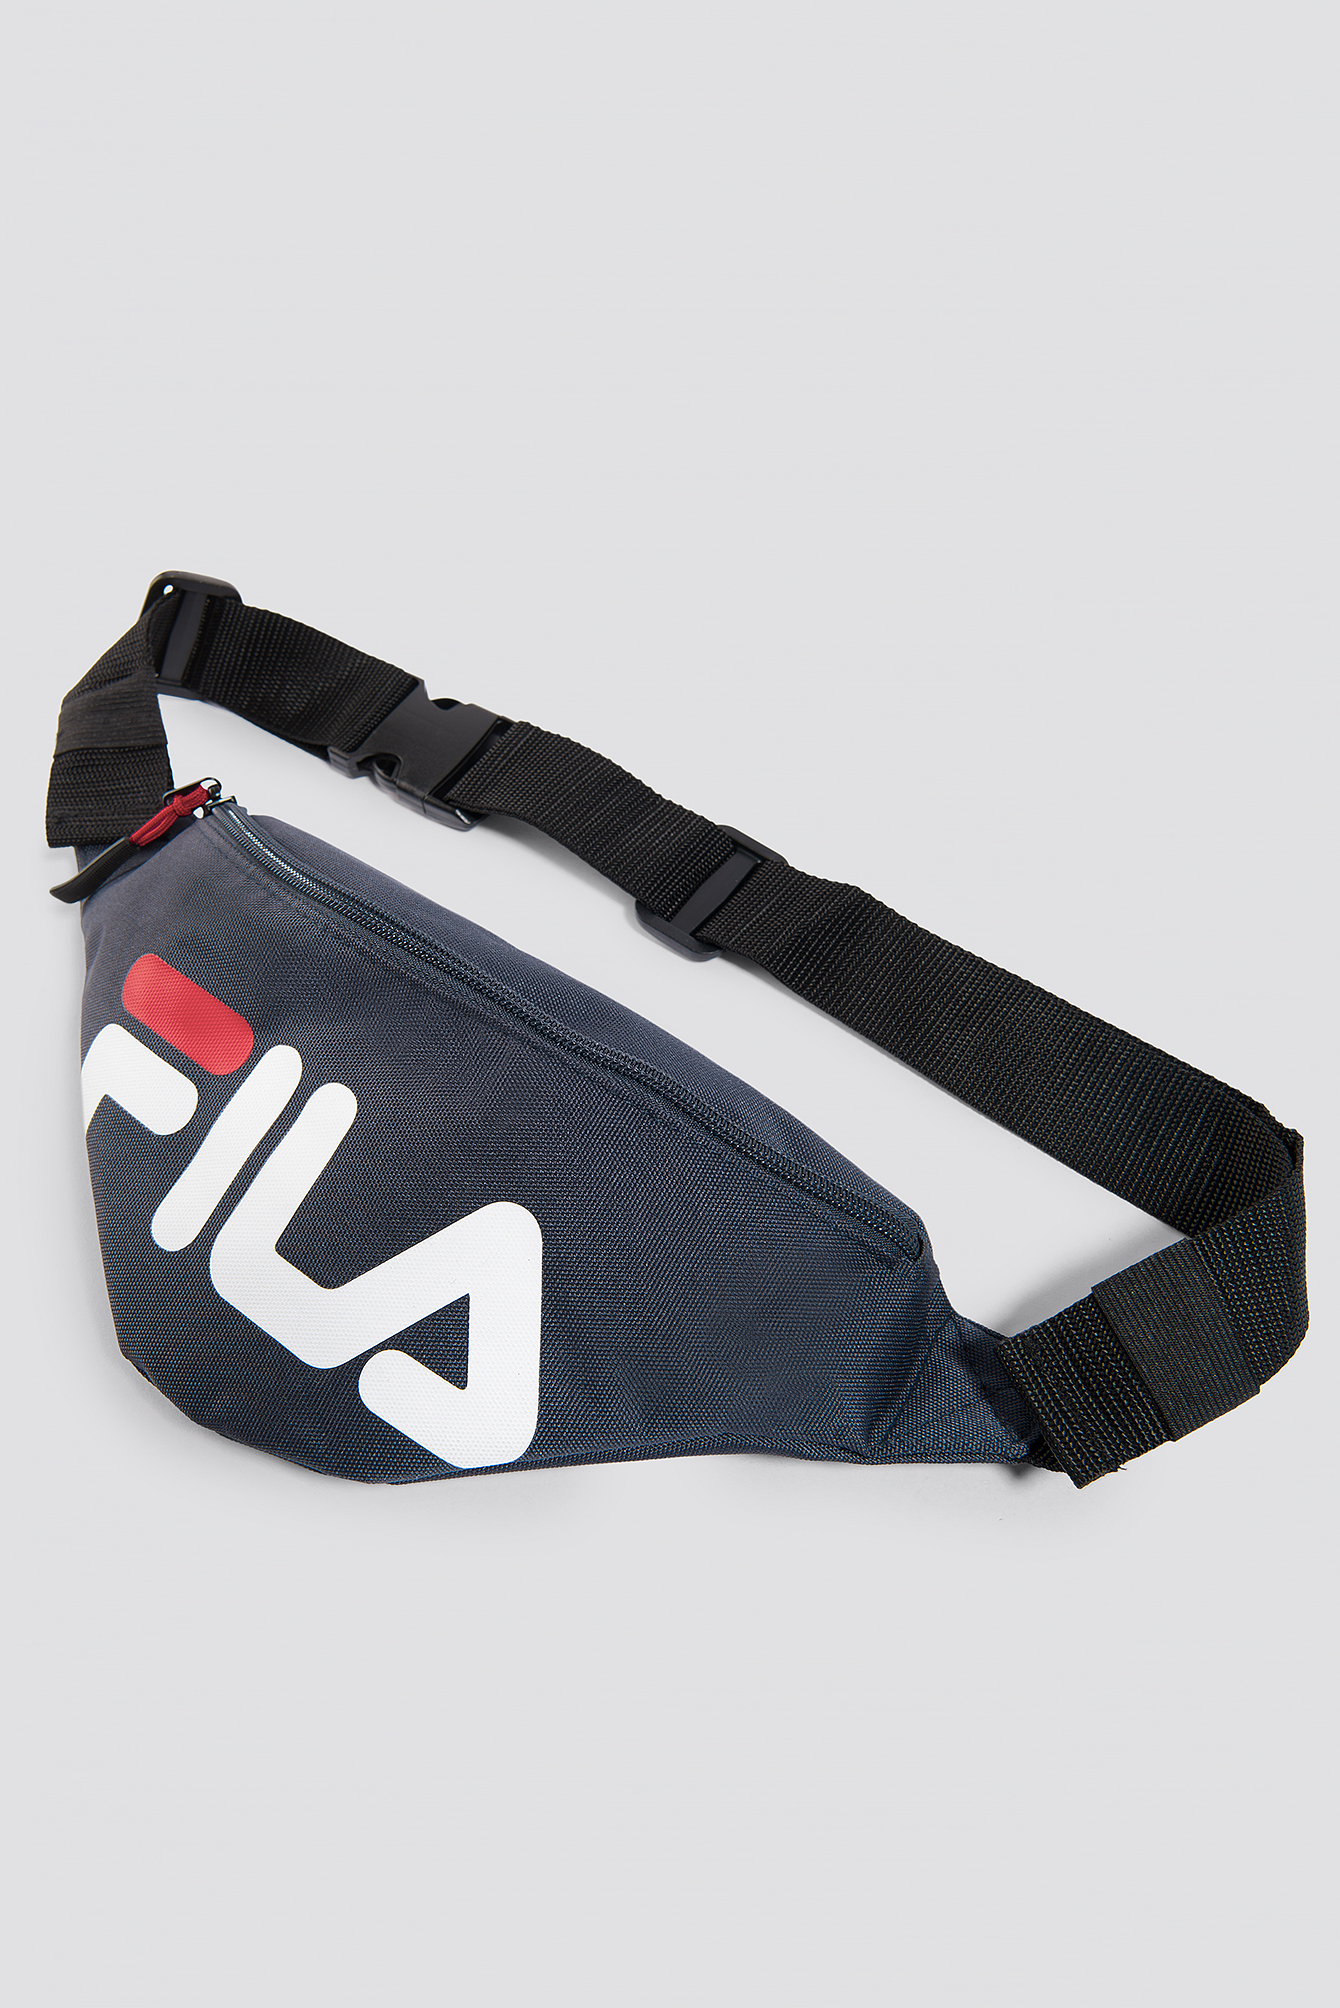 Waist Bag Slim Peacoat Ready Stock Fila Zipper On